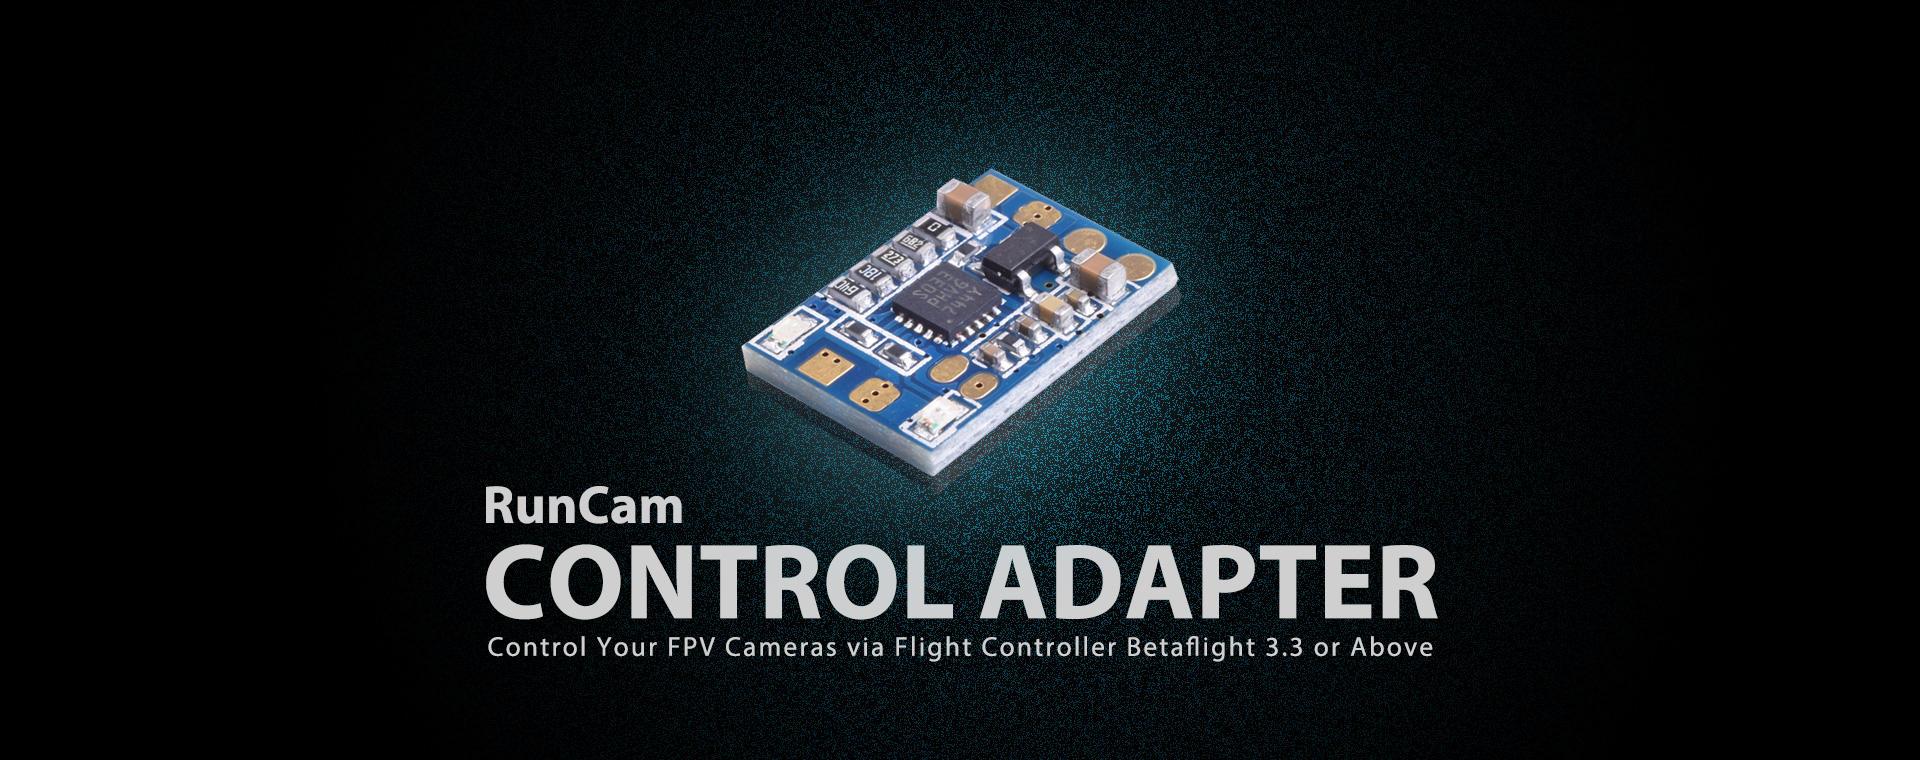 controladapter-1.jpg